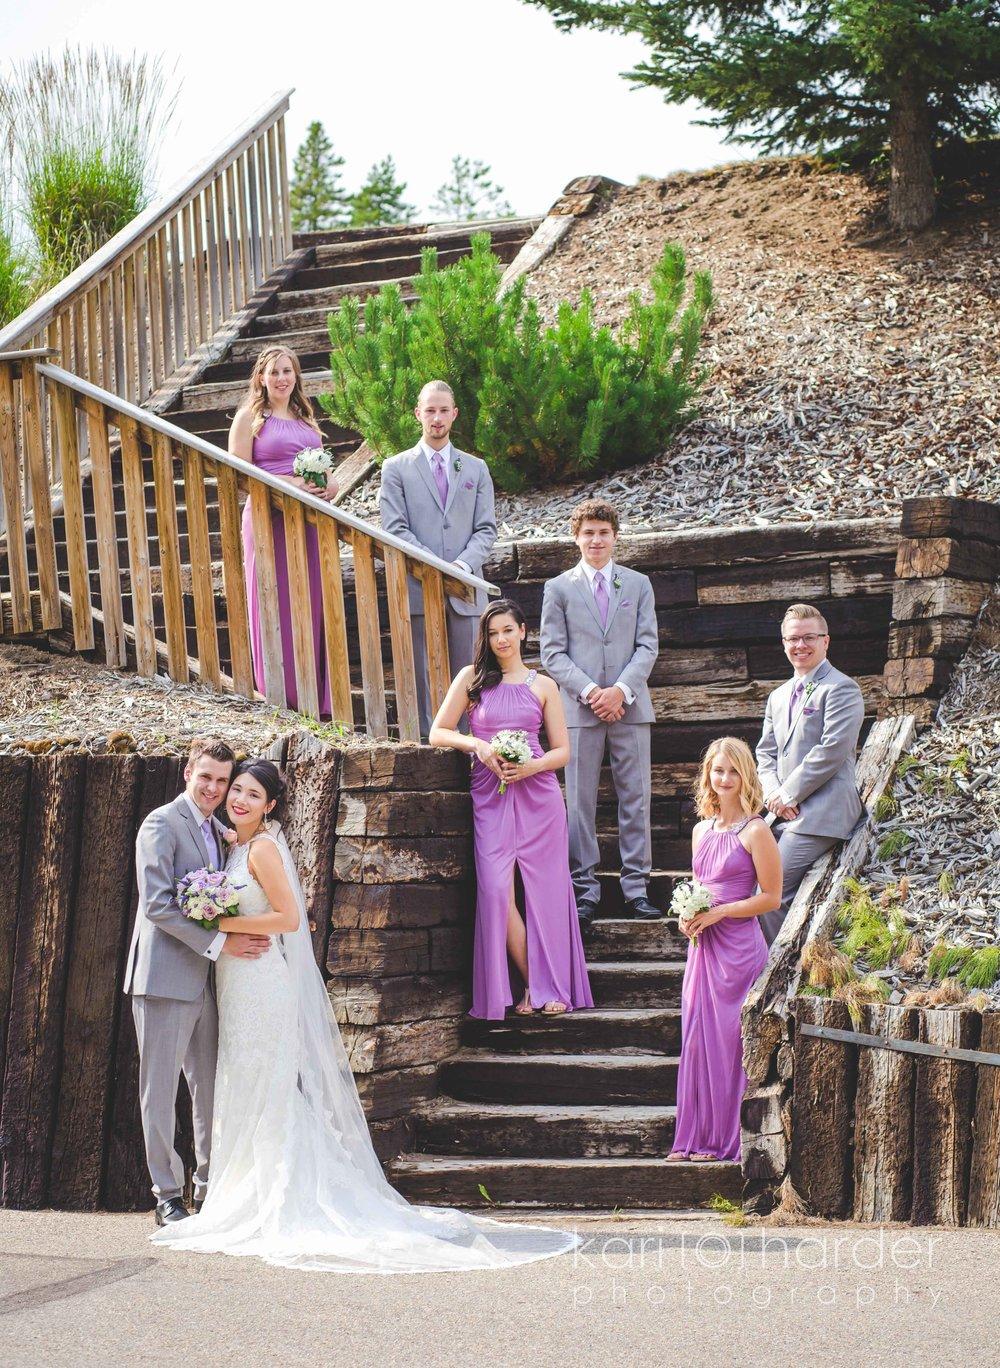 Wedding Party Formals-14.jpg